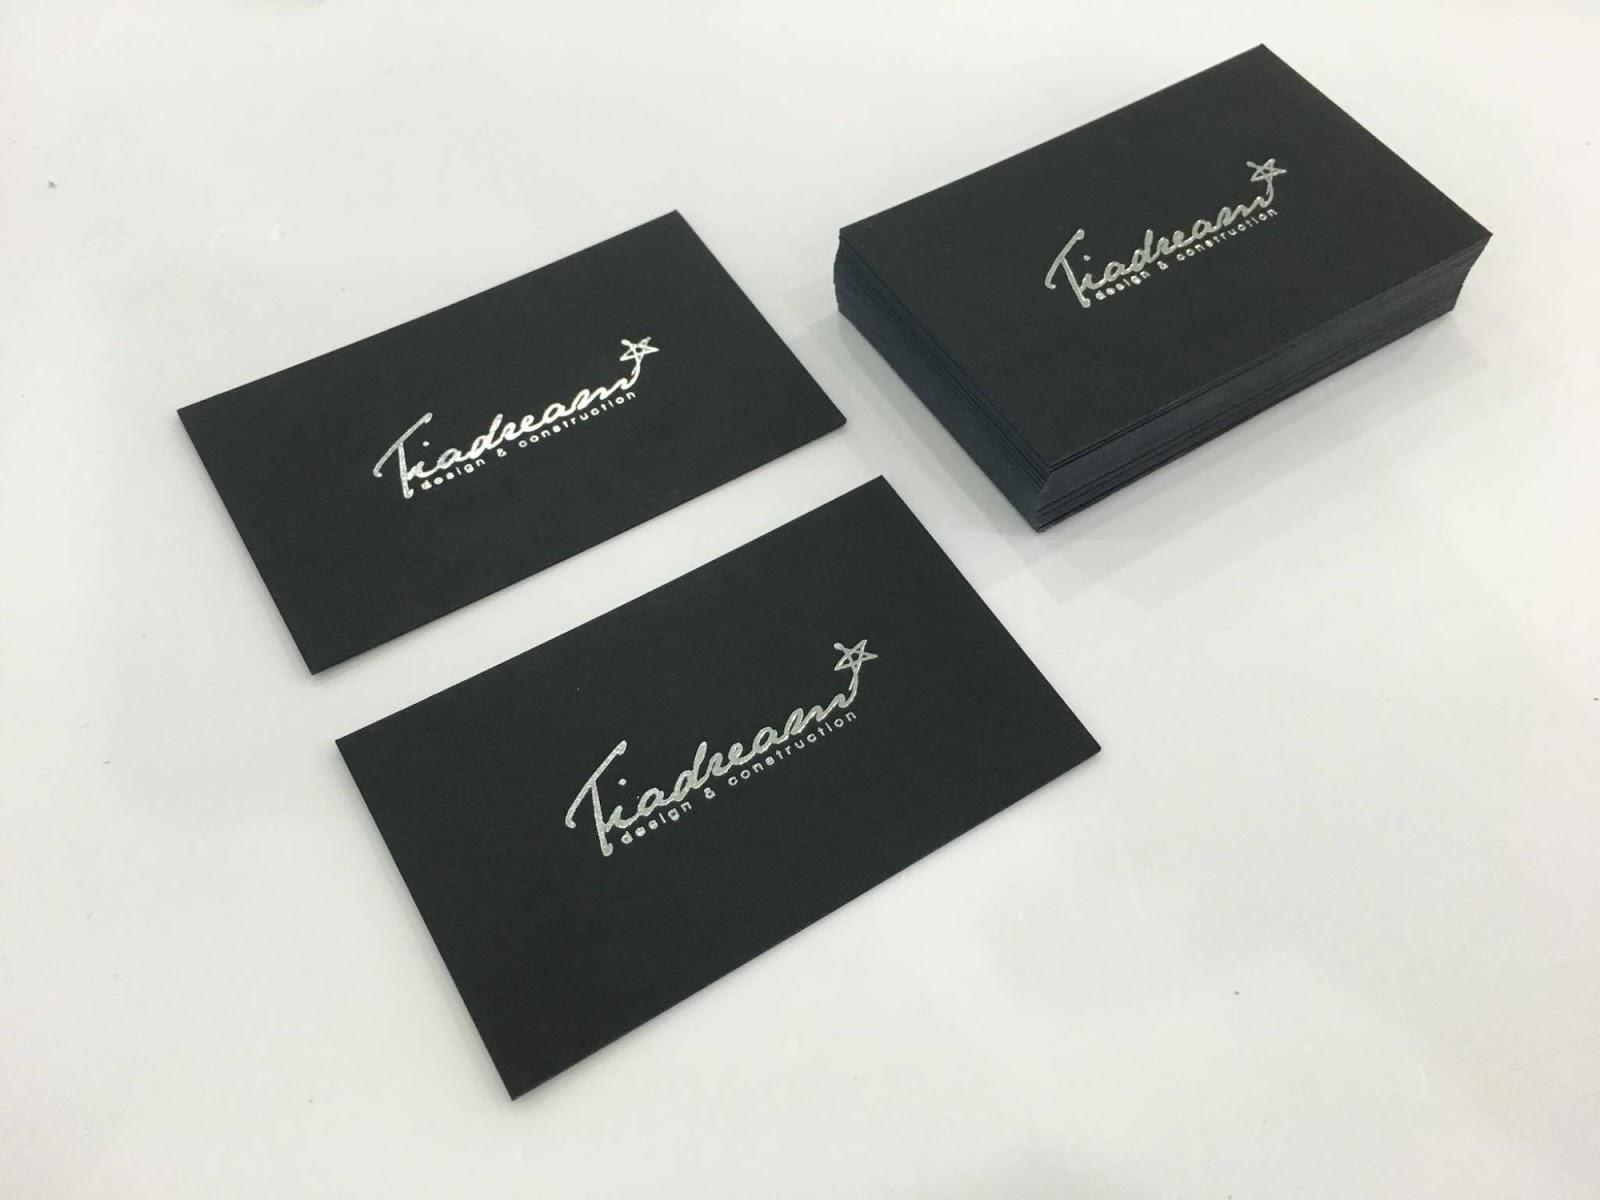 in-name-card-lay-lien-quan-binh-thanh-1